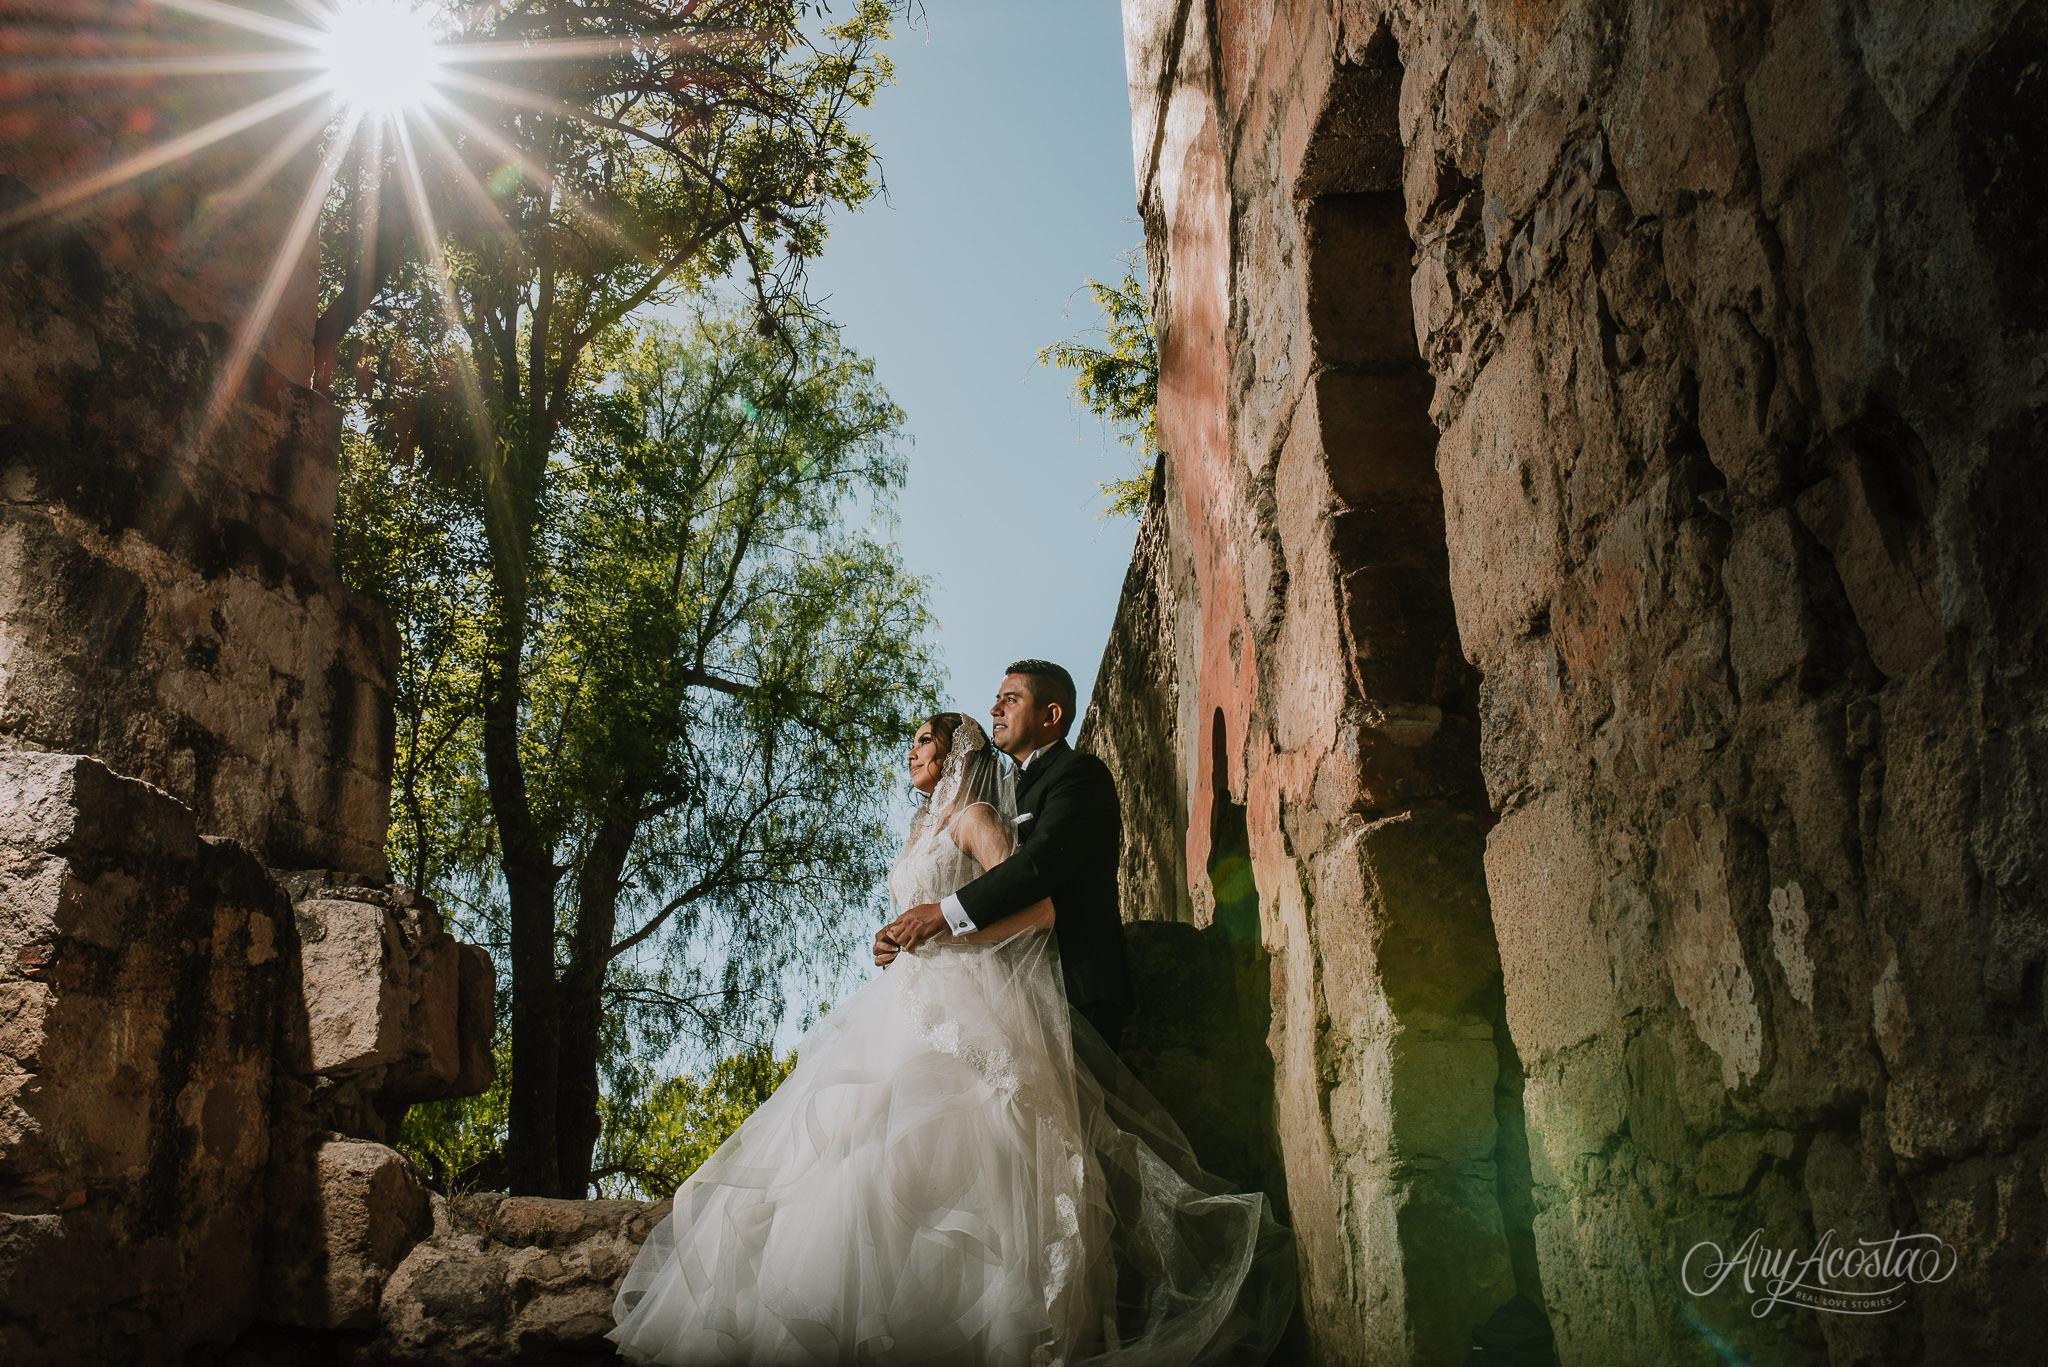 yazmin_ernesto_wedding-201.JPG